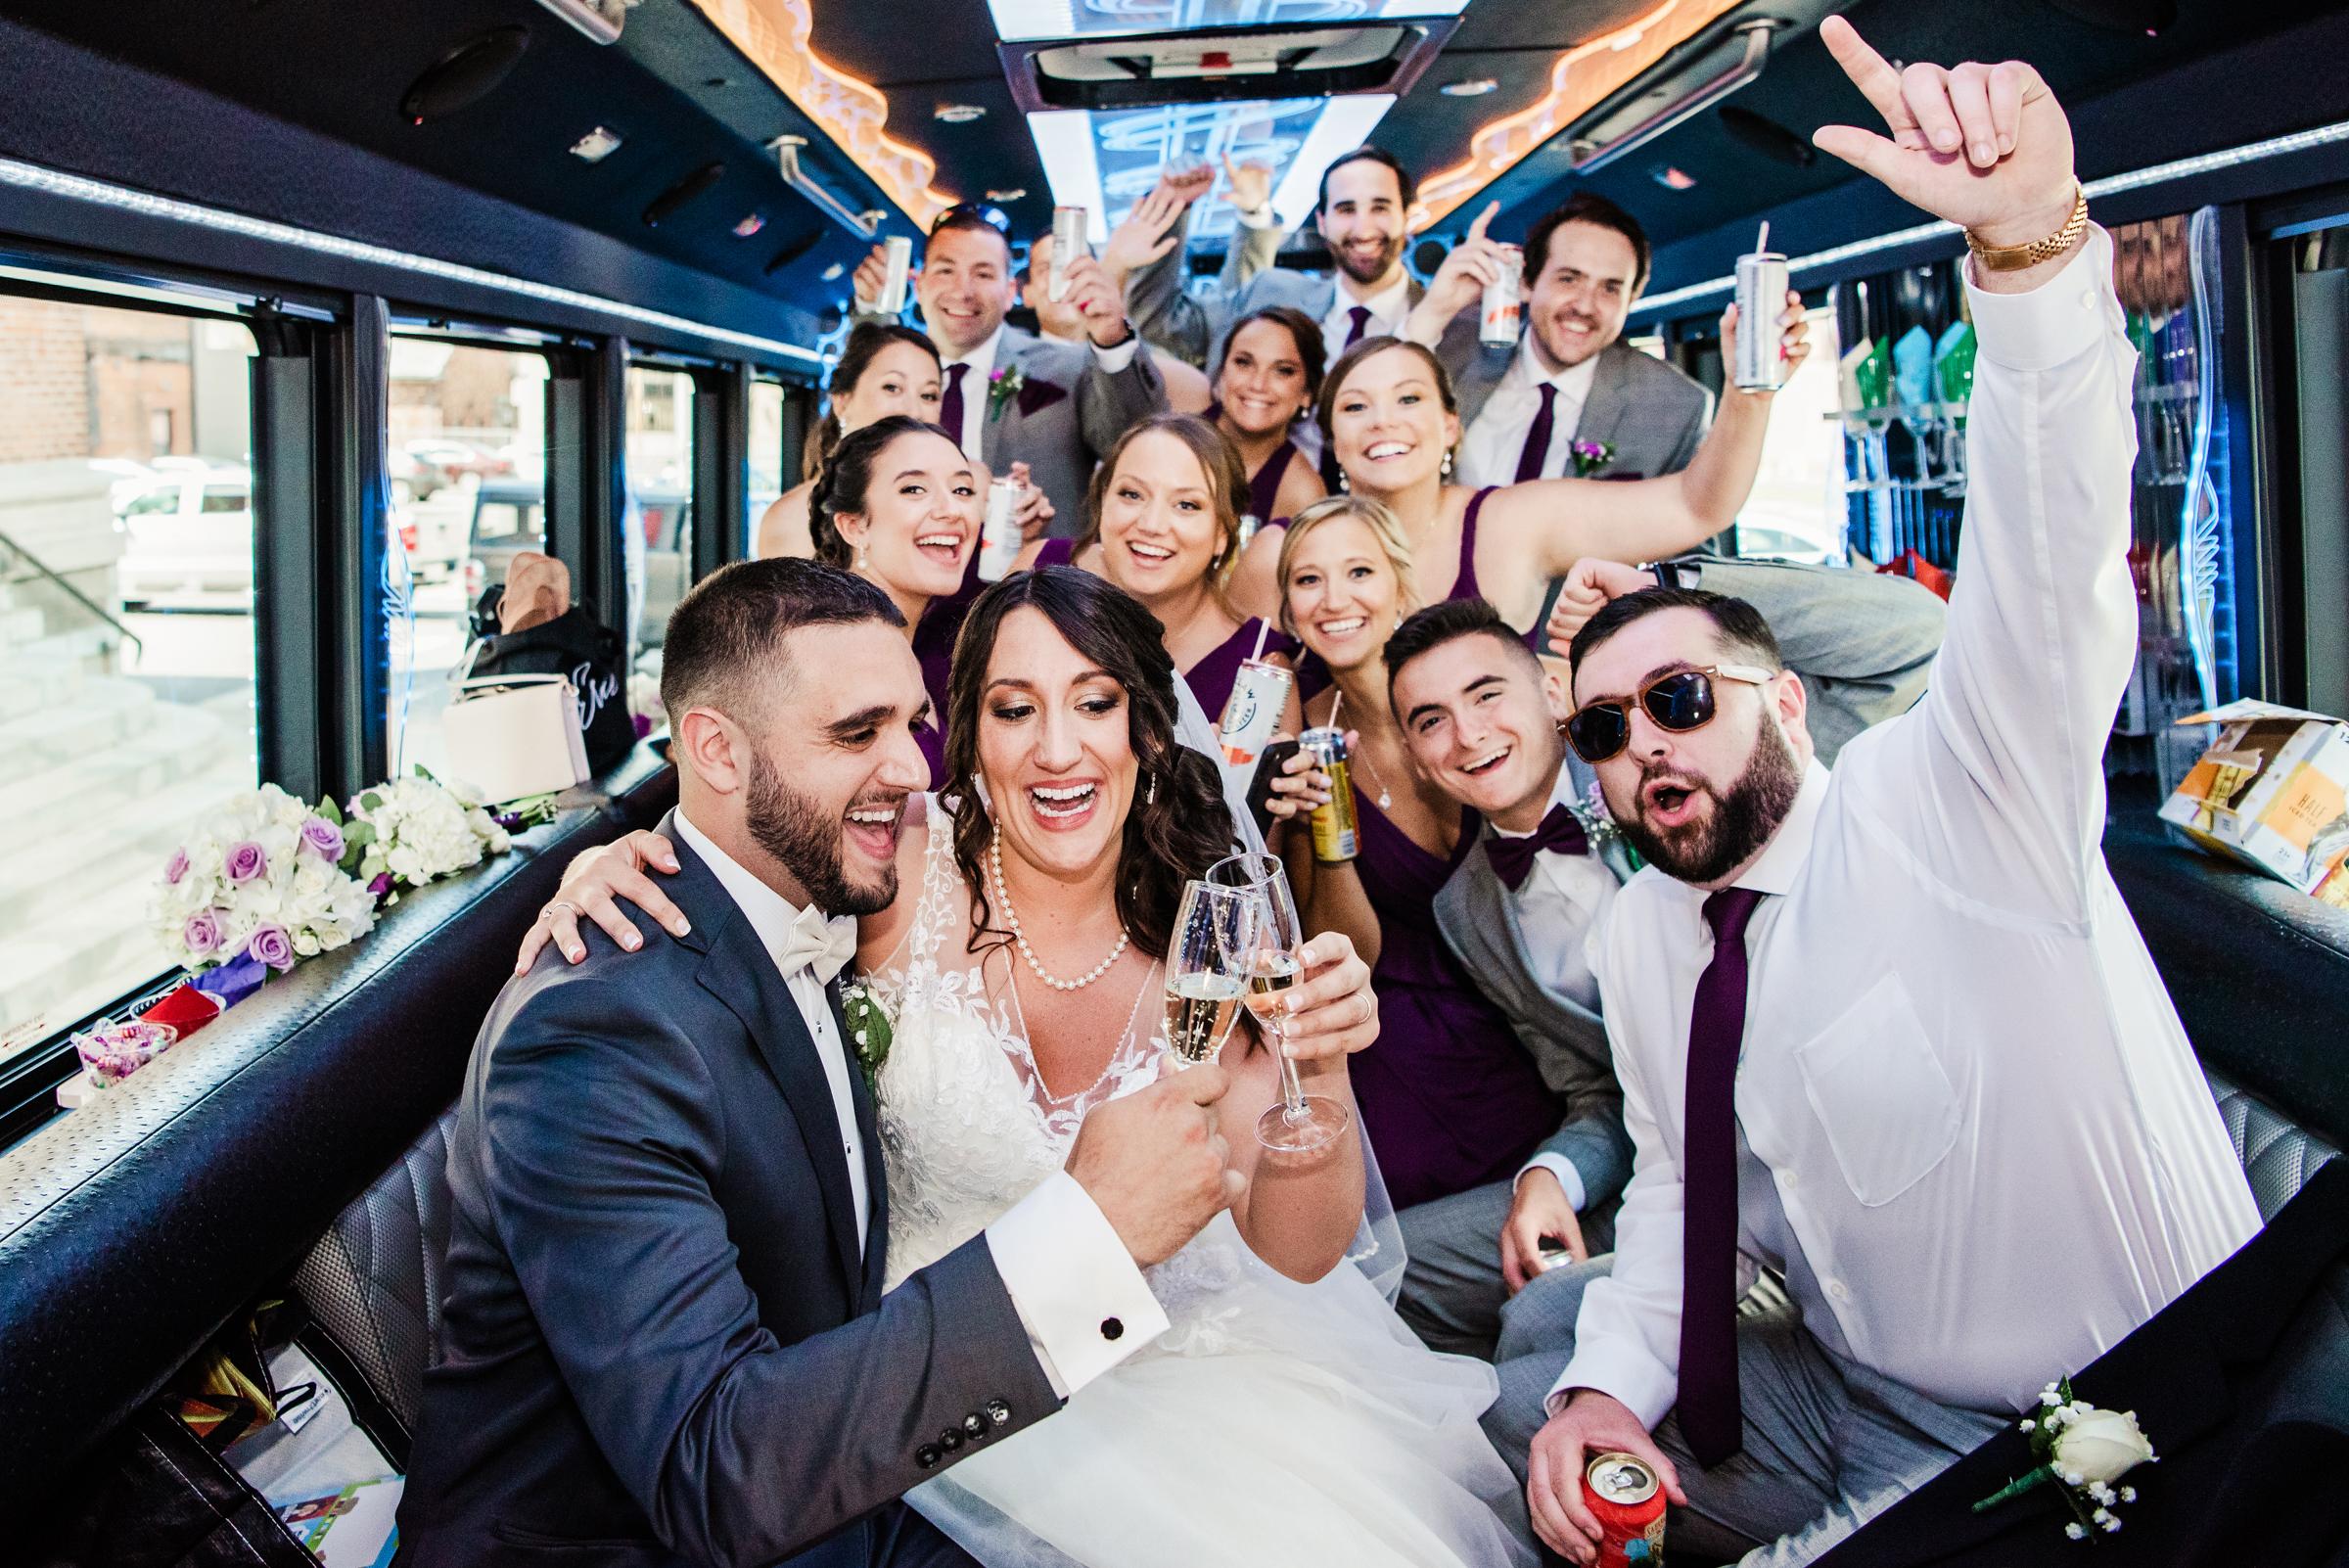 Historic_Old_St_Johns_Church_Valentinos_Banquet_Hall_Central_NY_Wedding_JILL_STUDIO_Rochester_NY_Photographer_DSC_6008.jpg